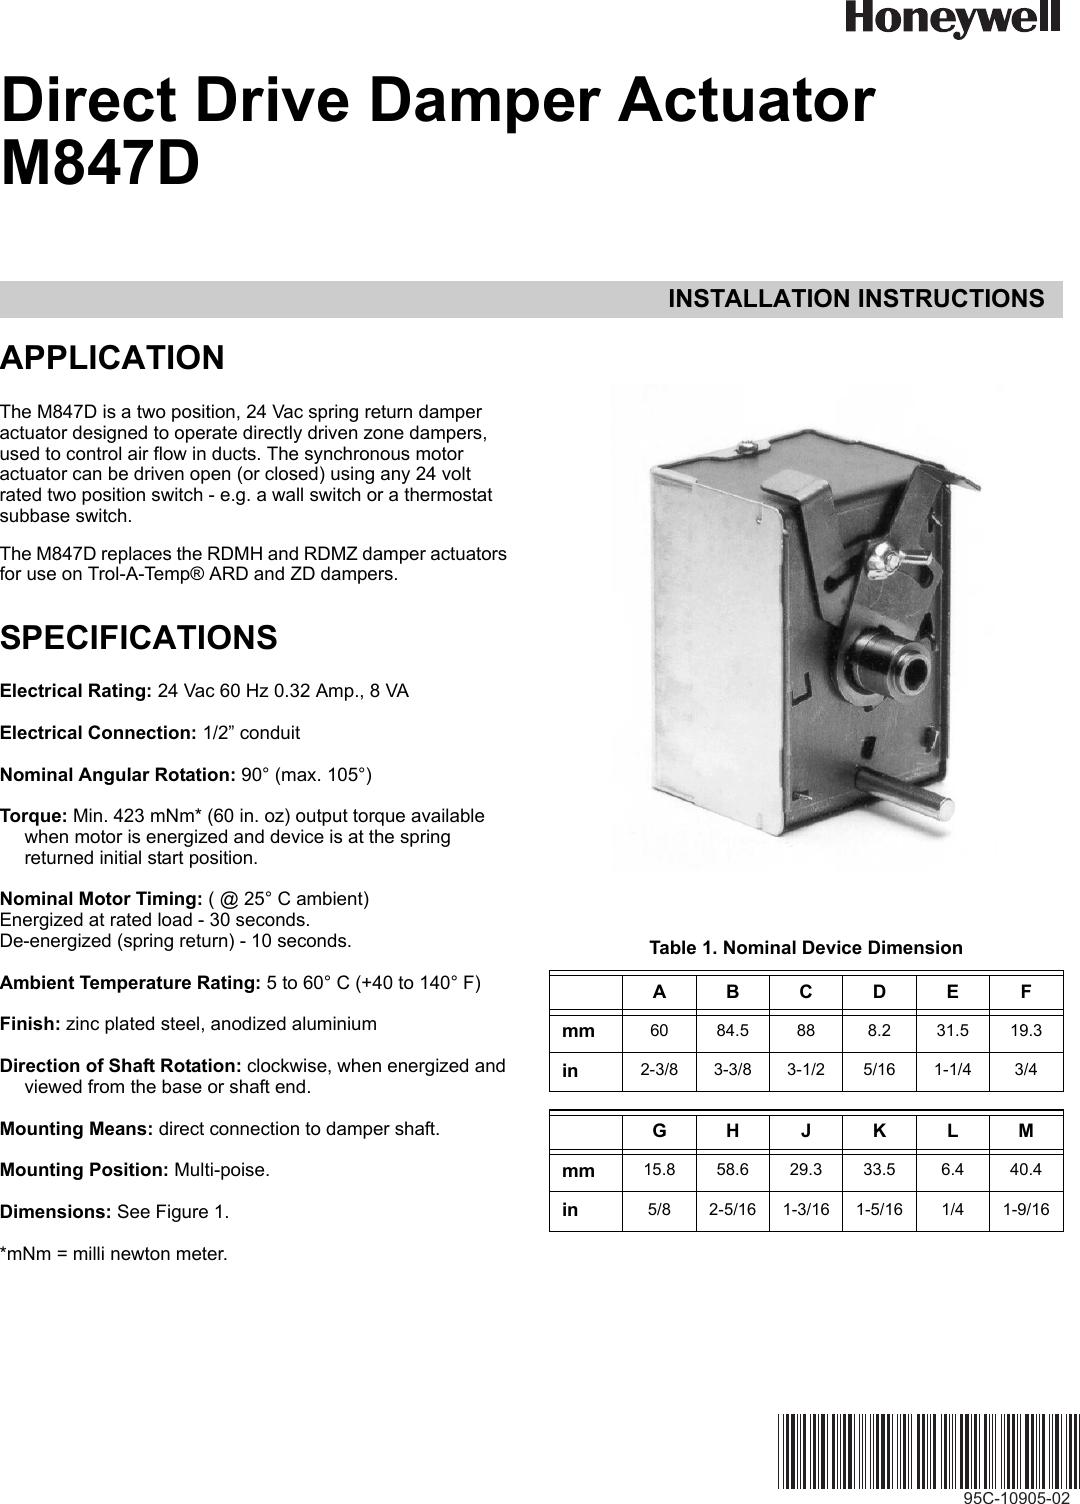 honeywell automobile parts m847d users manual 95c 10905 a direct rh usermanual wiki Honeywell Pro 8000 Thermostat Manual Honeywell Thermostat Operating Manual